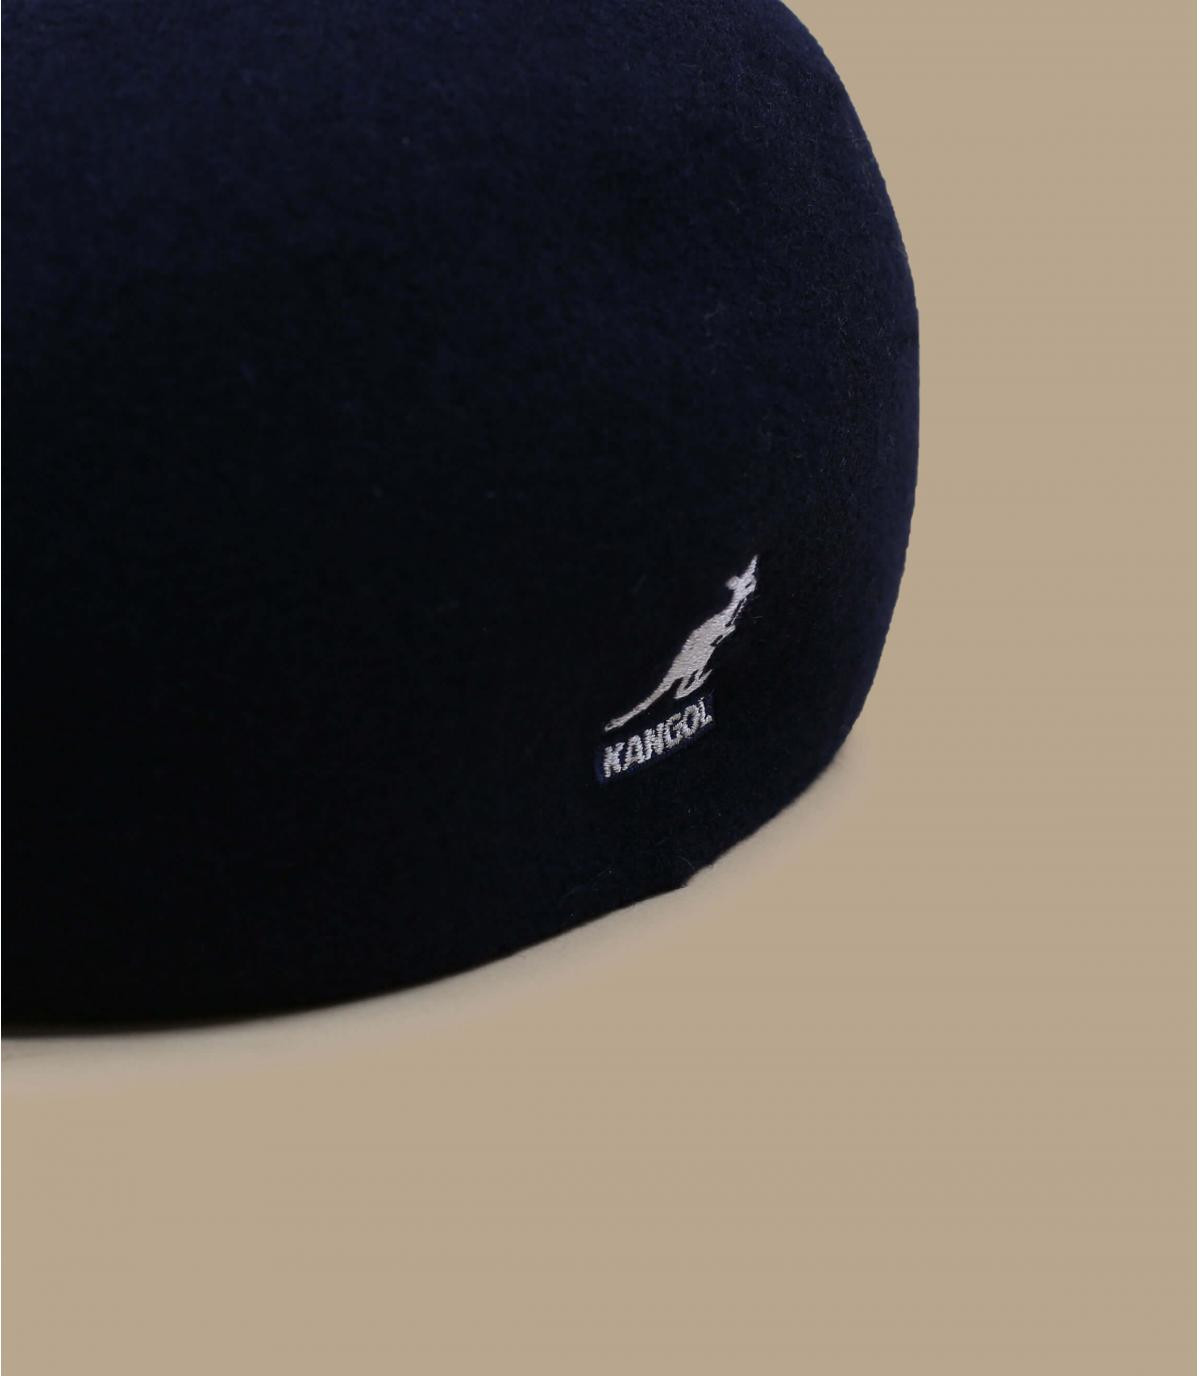 Detalles 507 wool seamless navy imagen 2